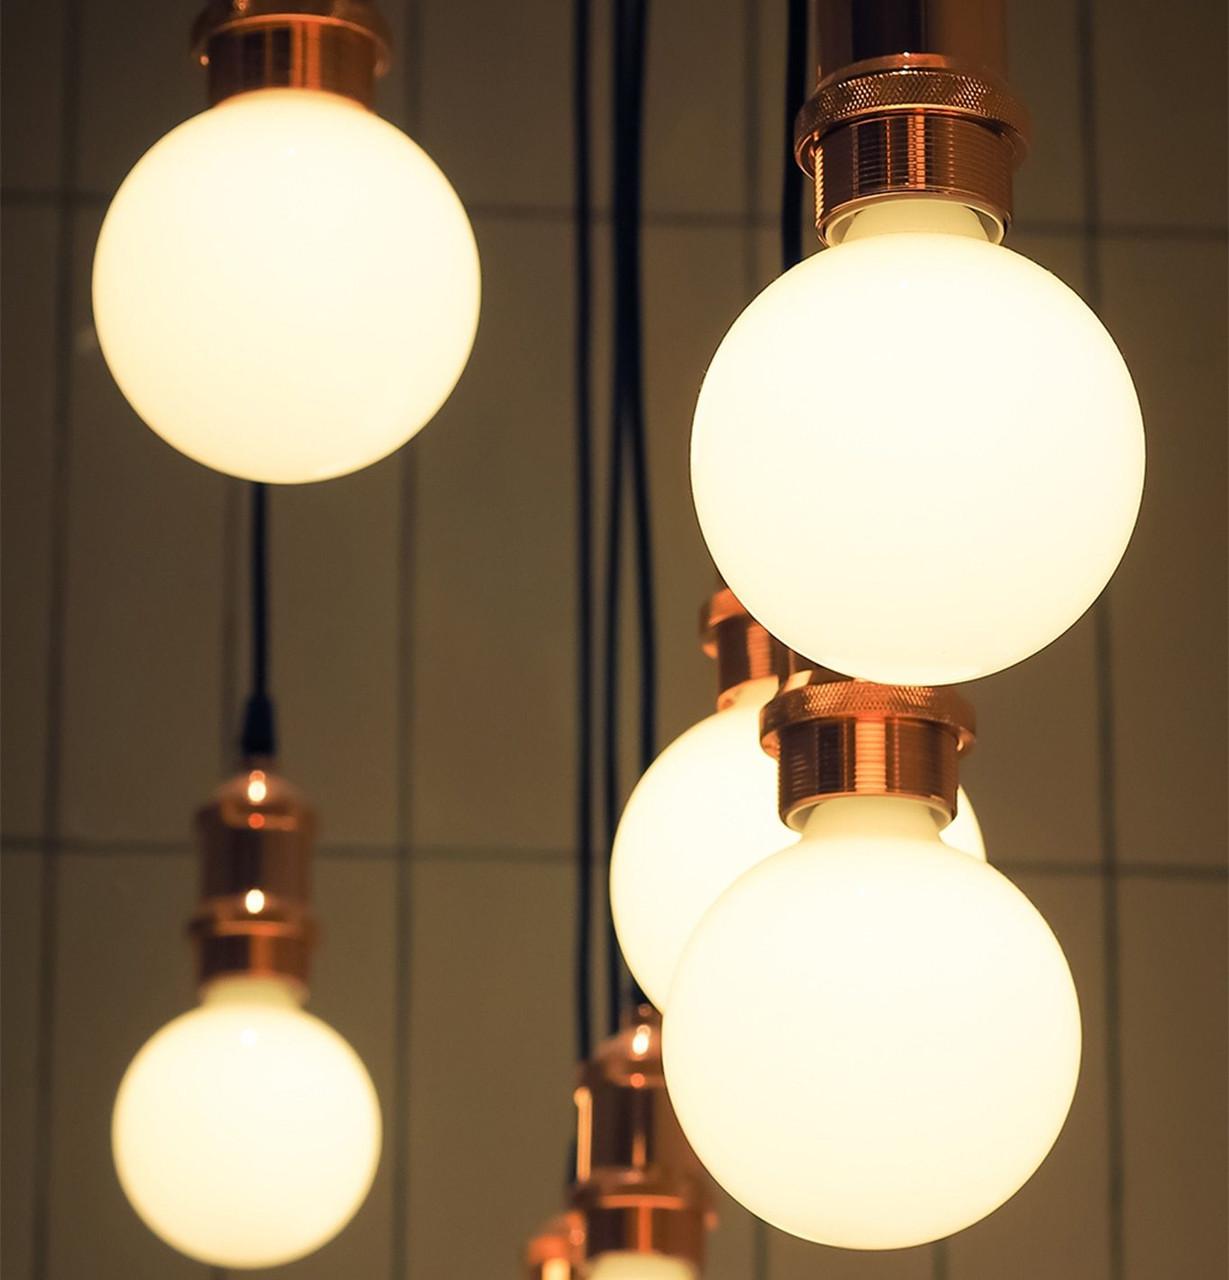 LED Dimmable G95 2200K Light Bulbs